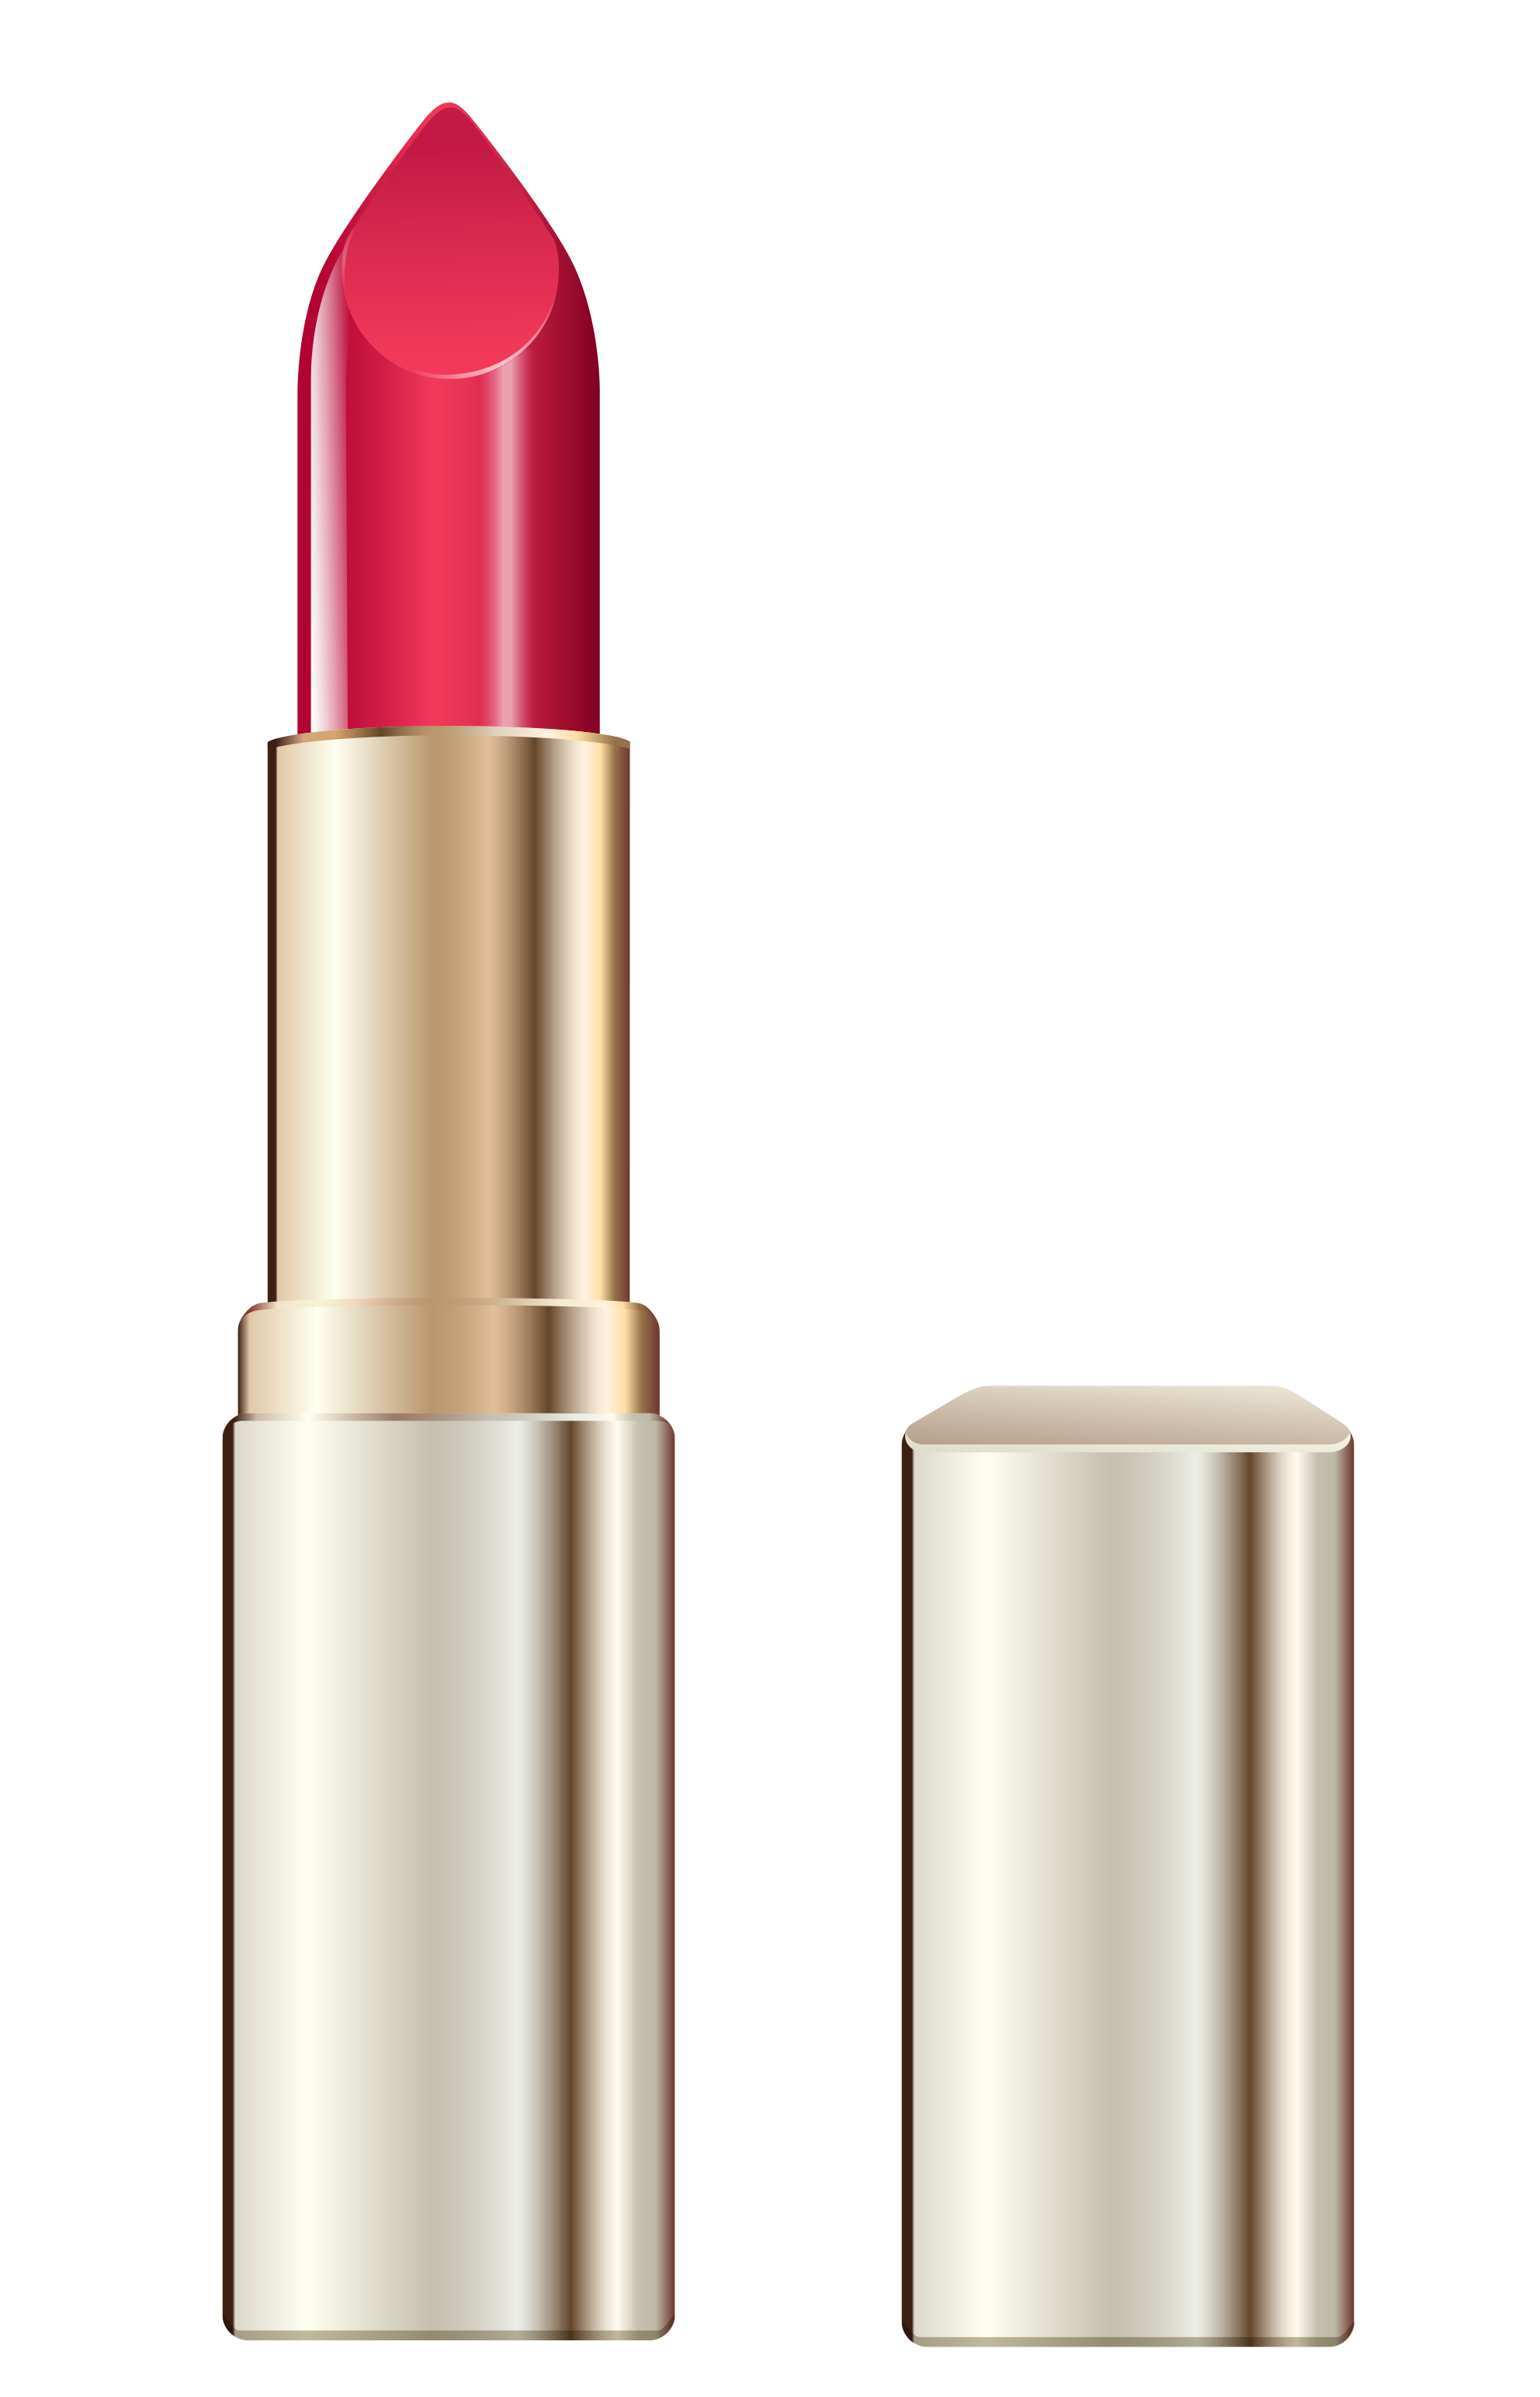 Lipstick PNG - 28304